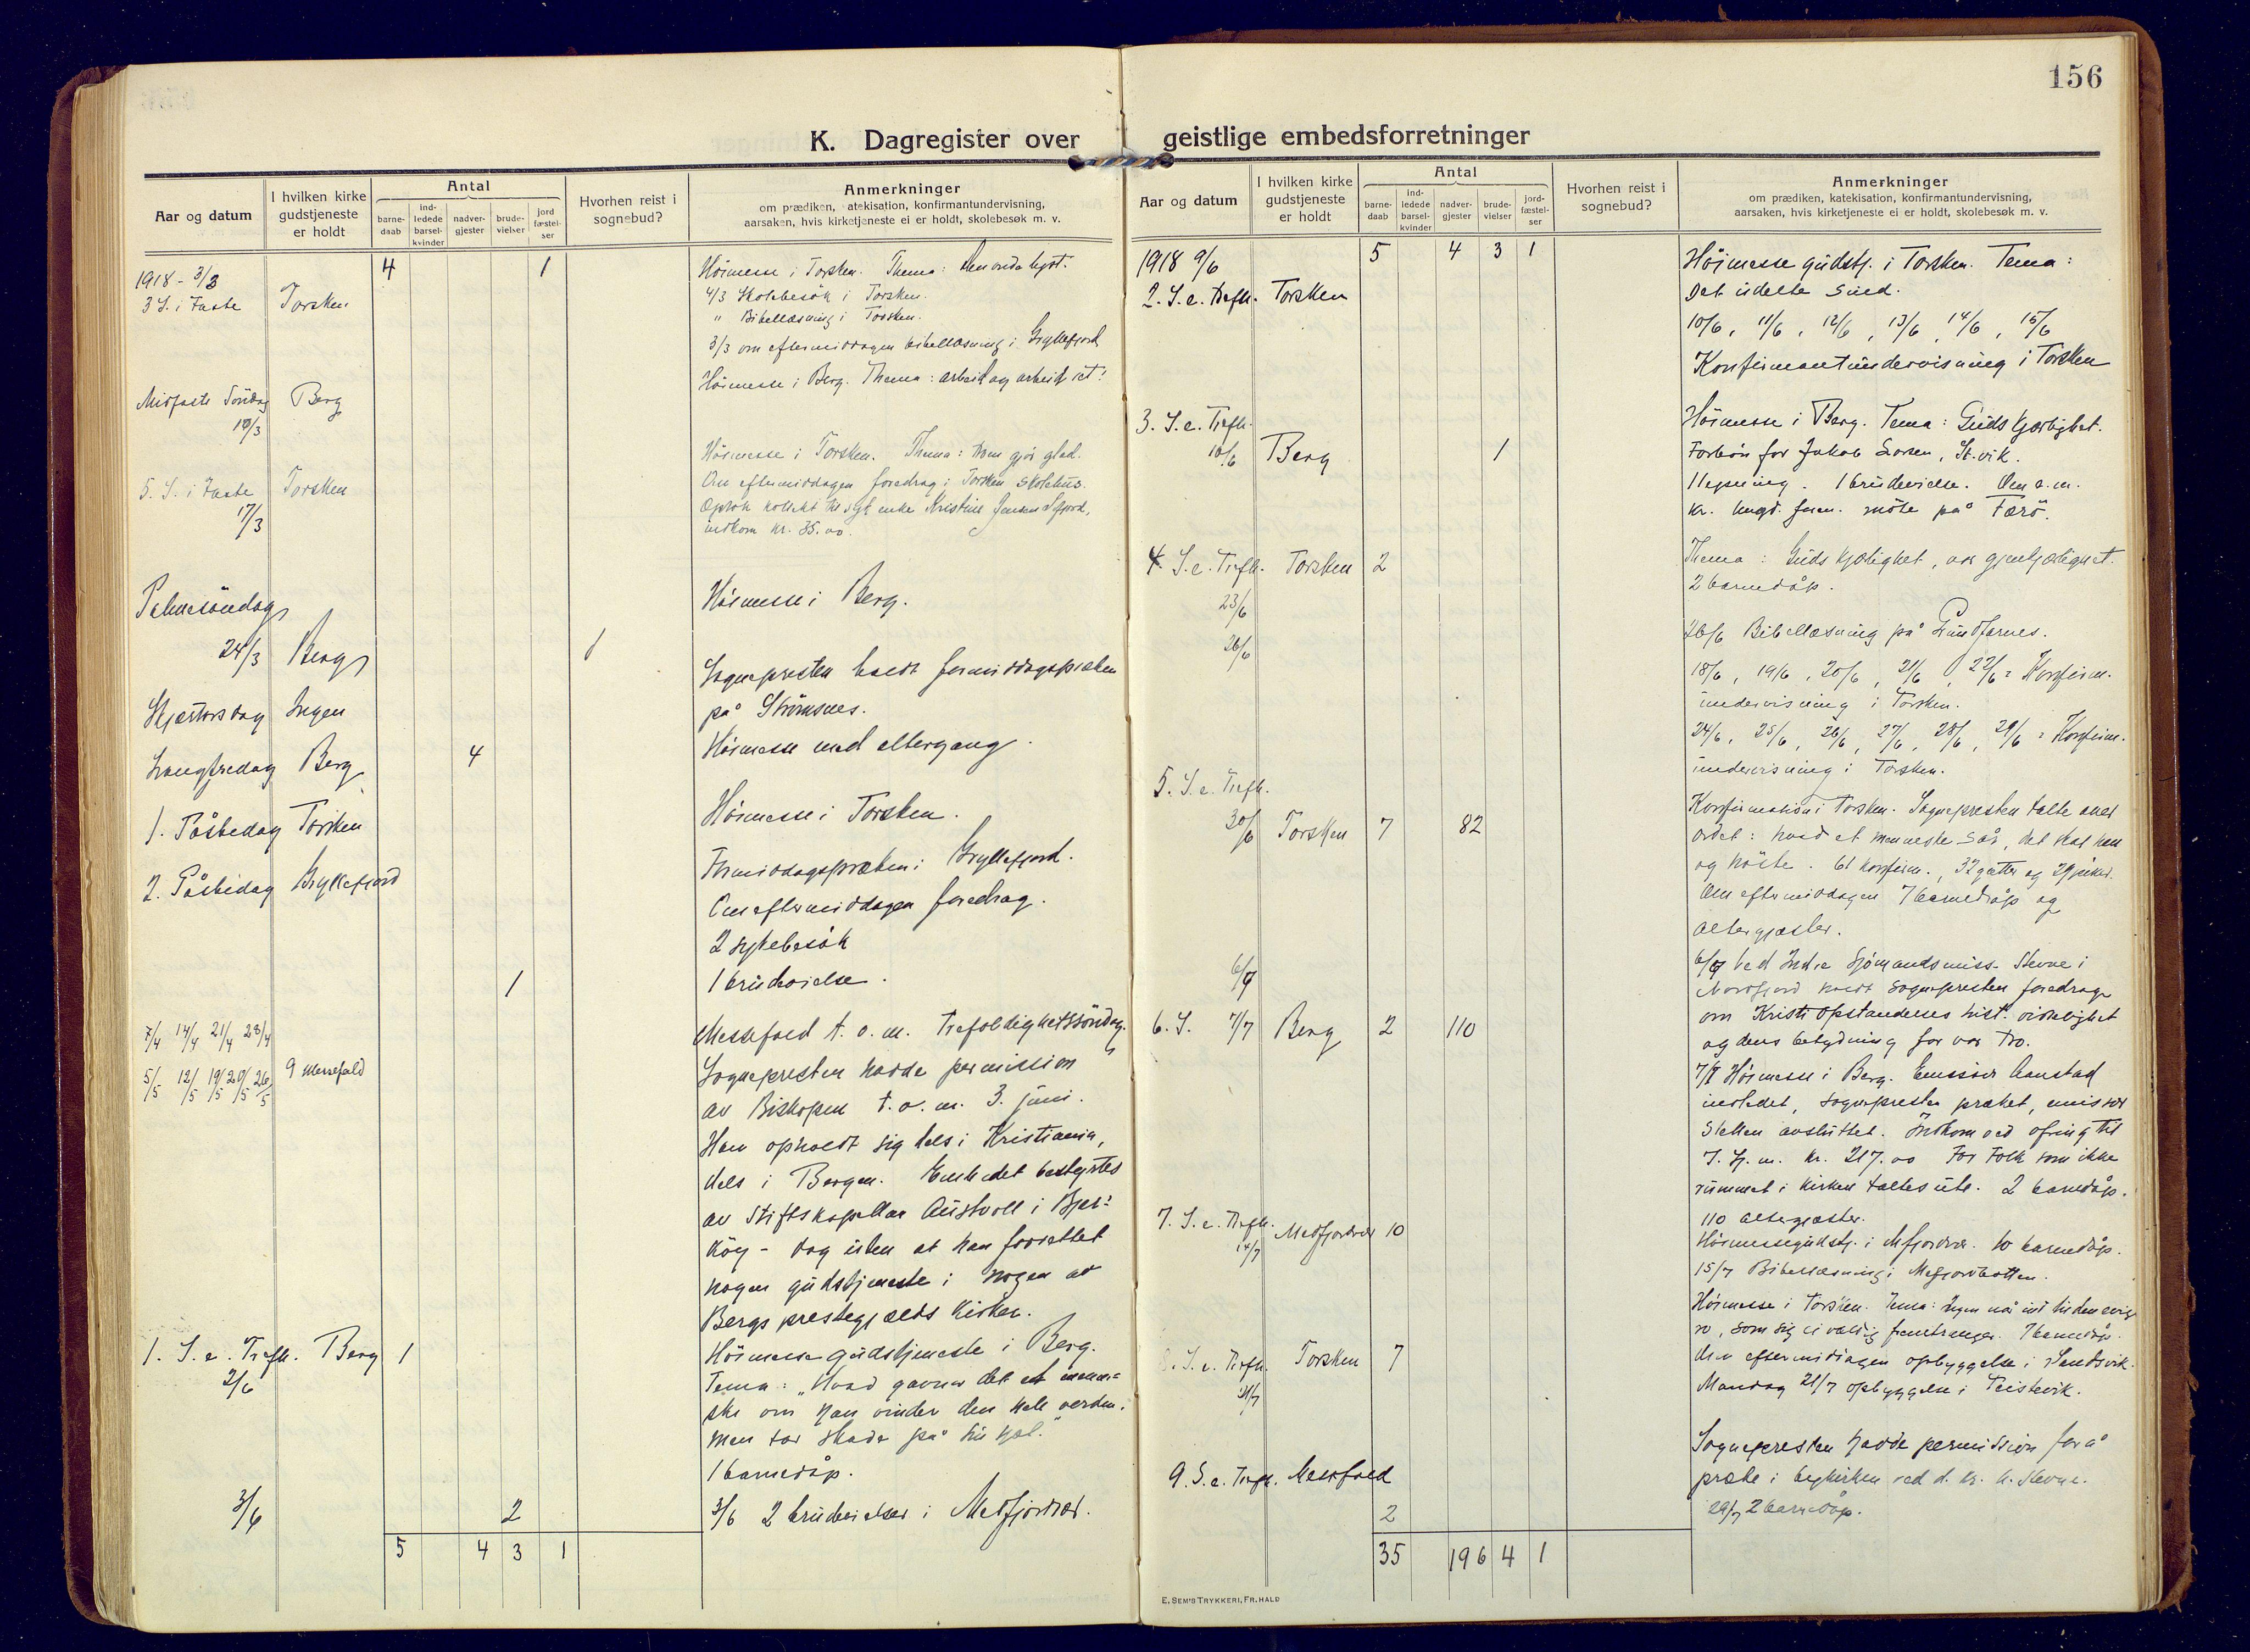 SATØ, Mefjord/Berg sokneprestkontor, G/Ga/Gaa: Ministerialbok nr. 9, 1916-1928, s. 156